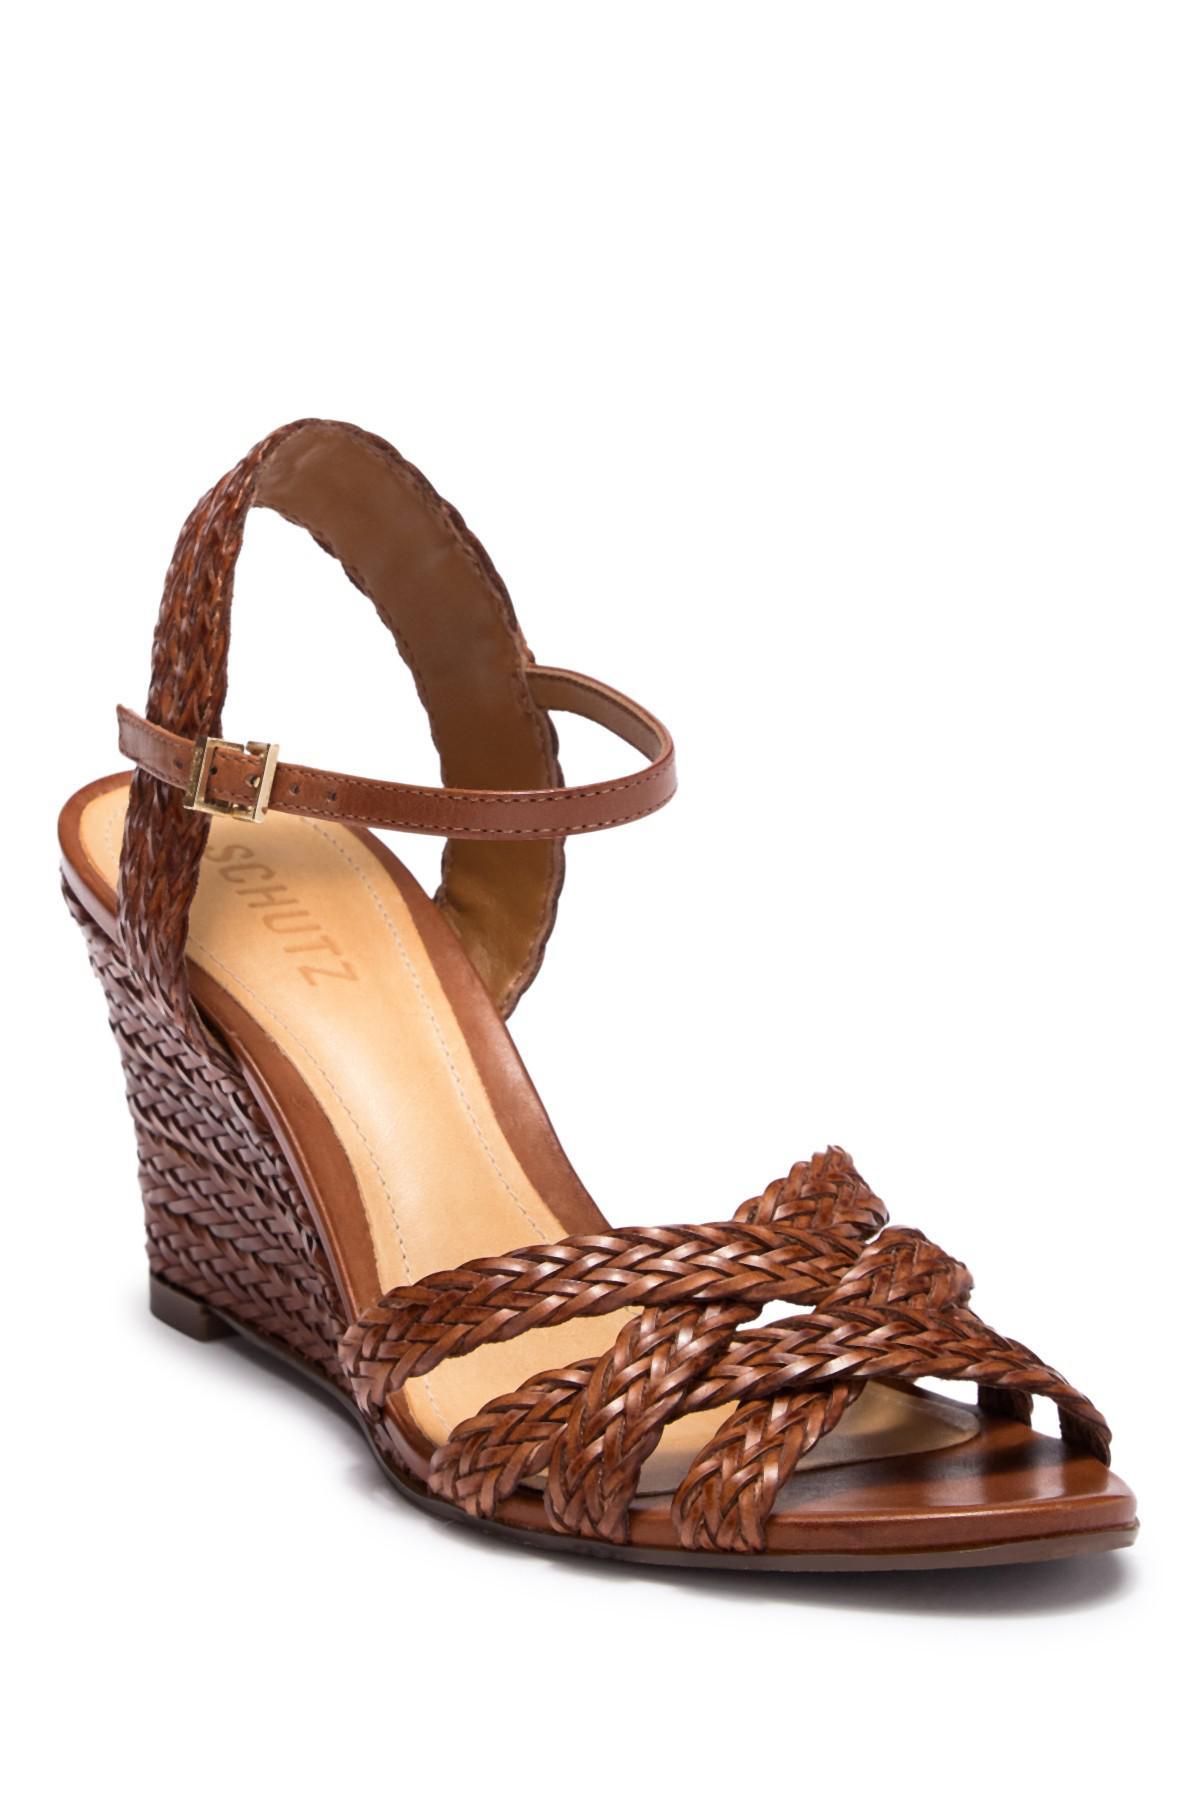 Schutz Mahoni Woven Leather Wedge Sandal MA2zfK